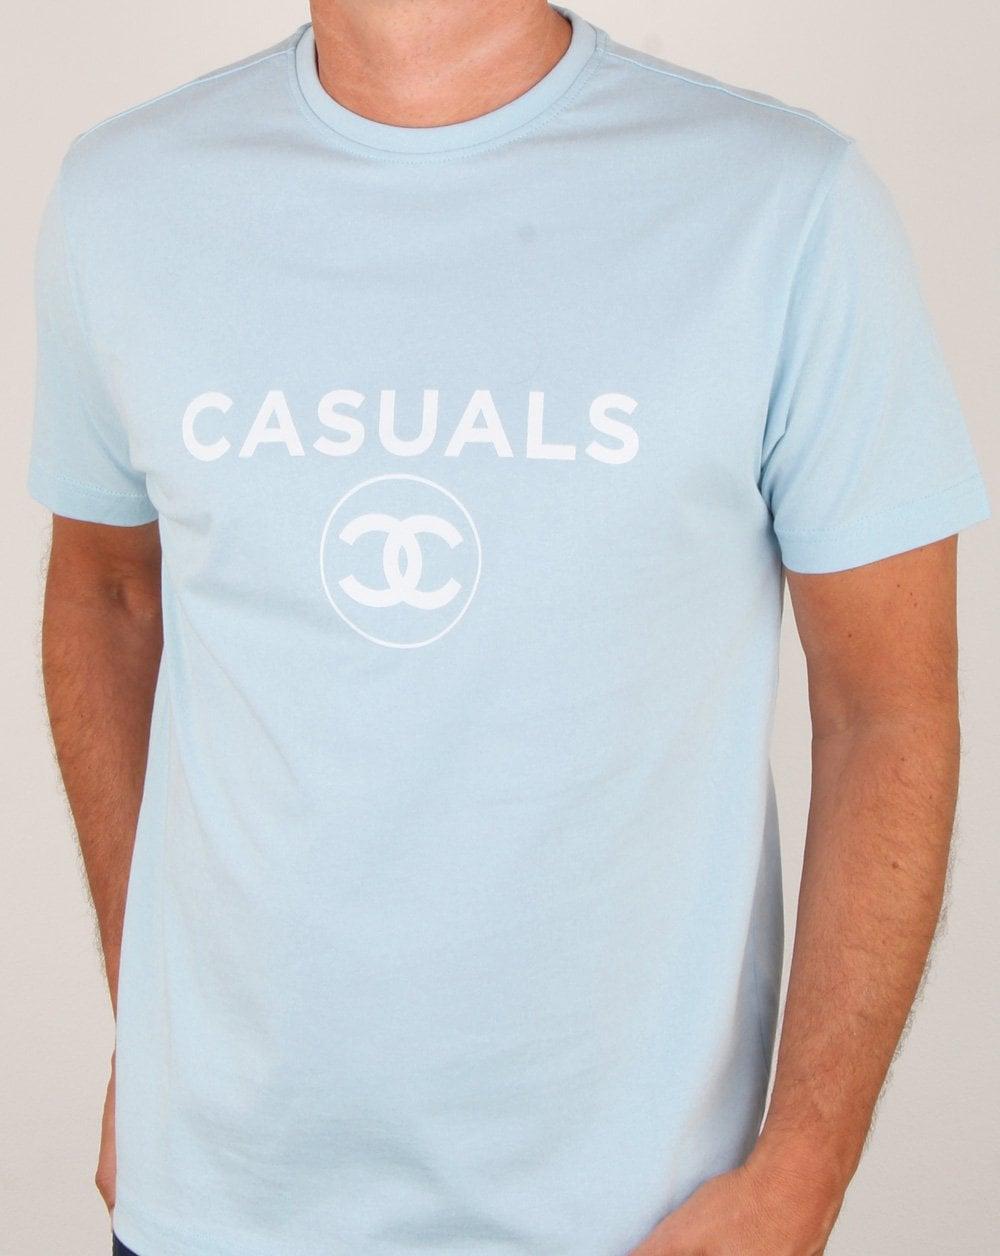 80s casuals t-shirt